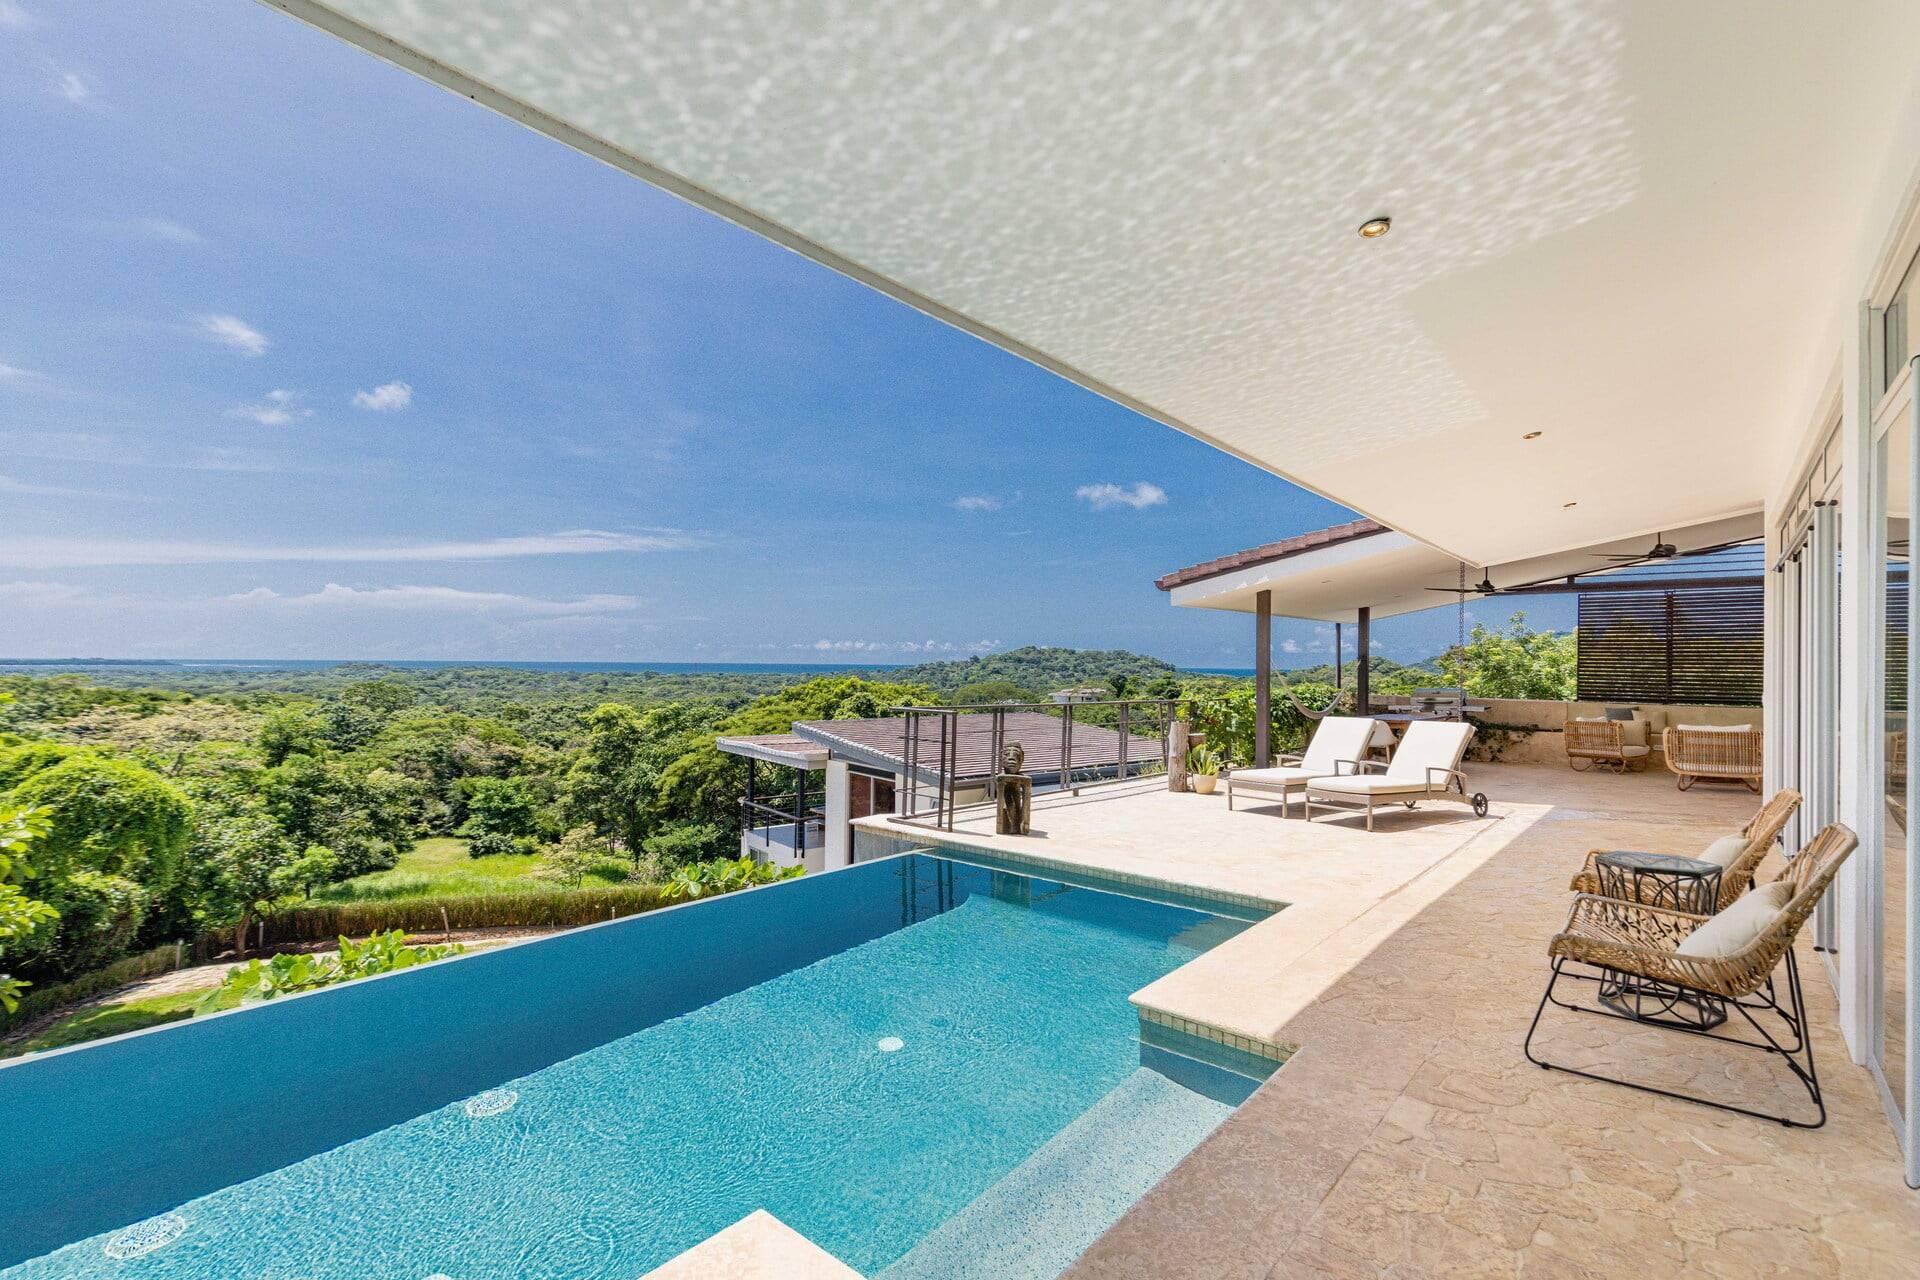 Casa Sunset – Ocean View Property for Sale in Playa Grande